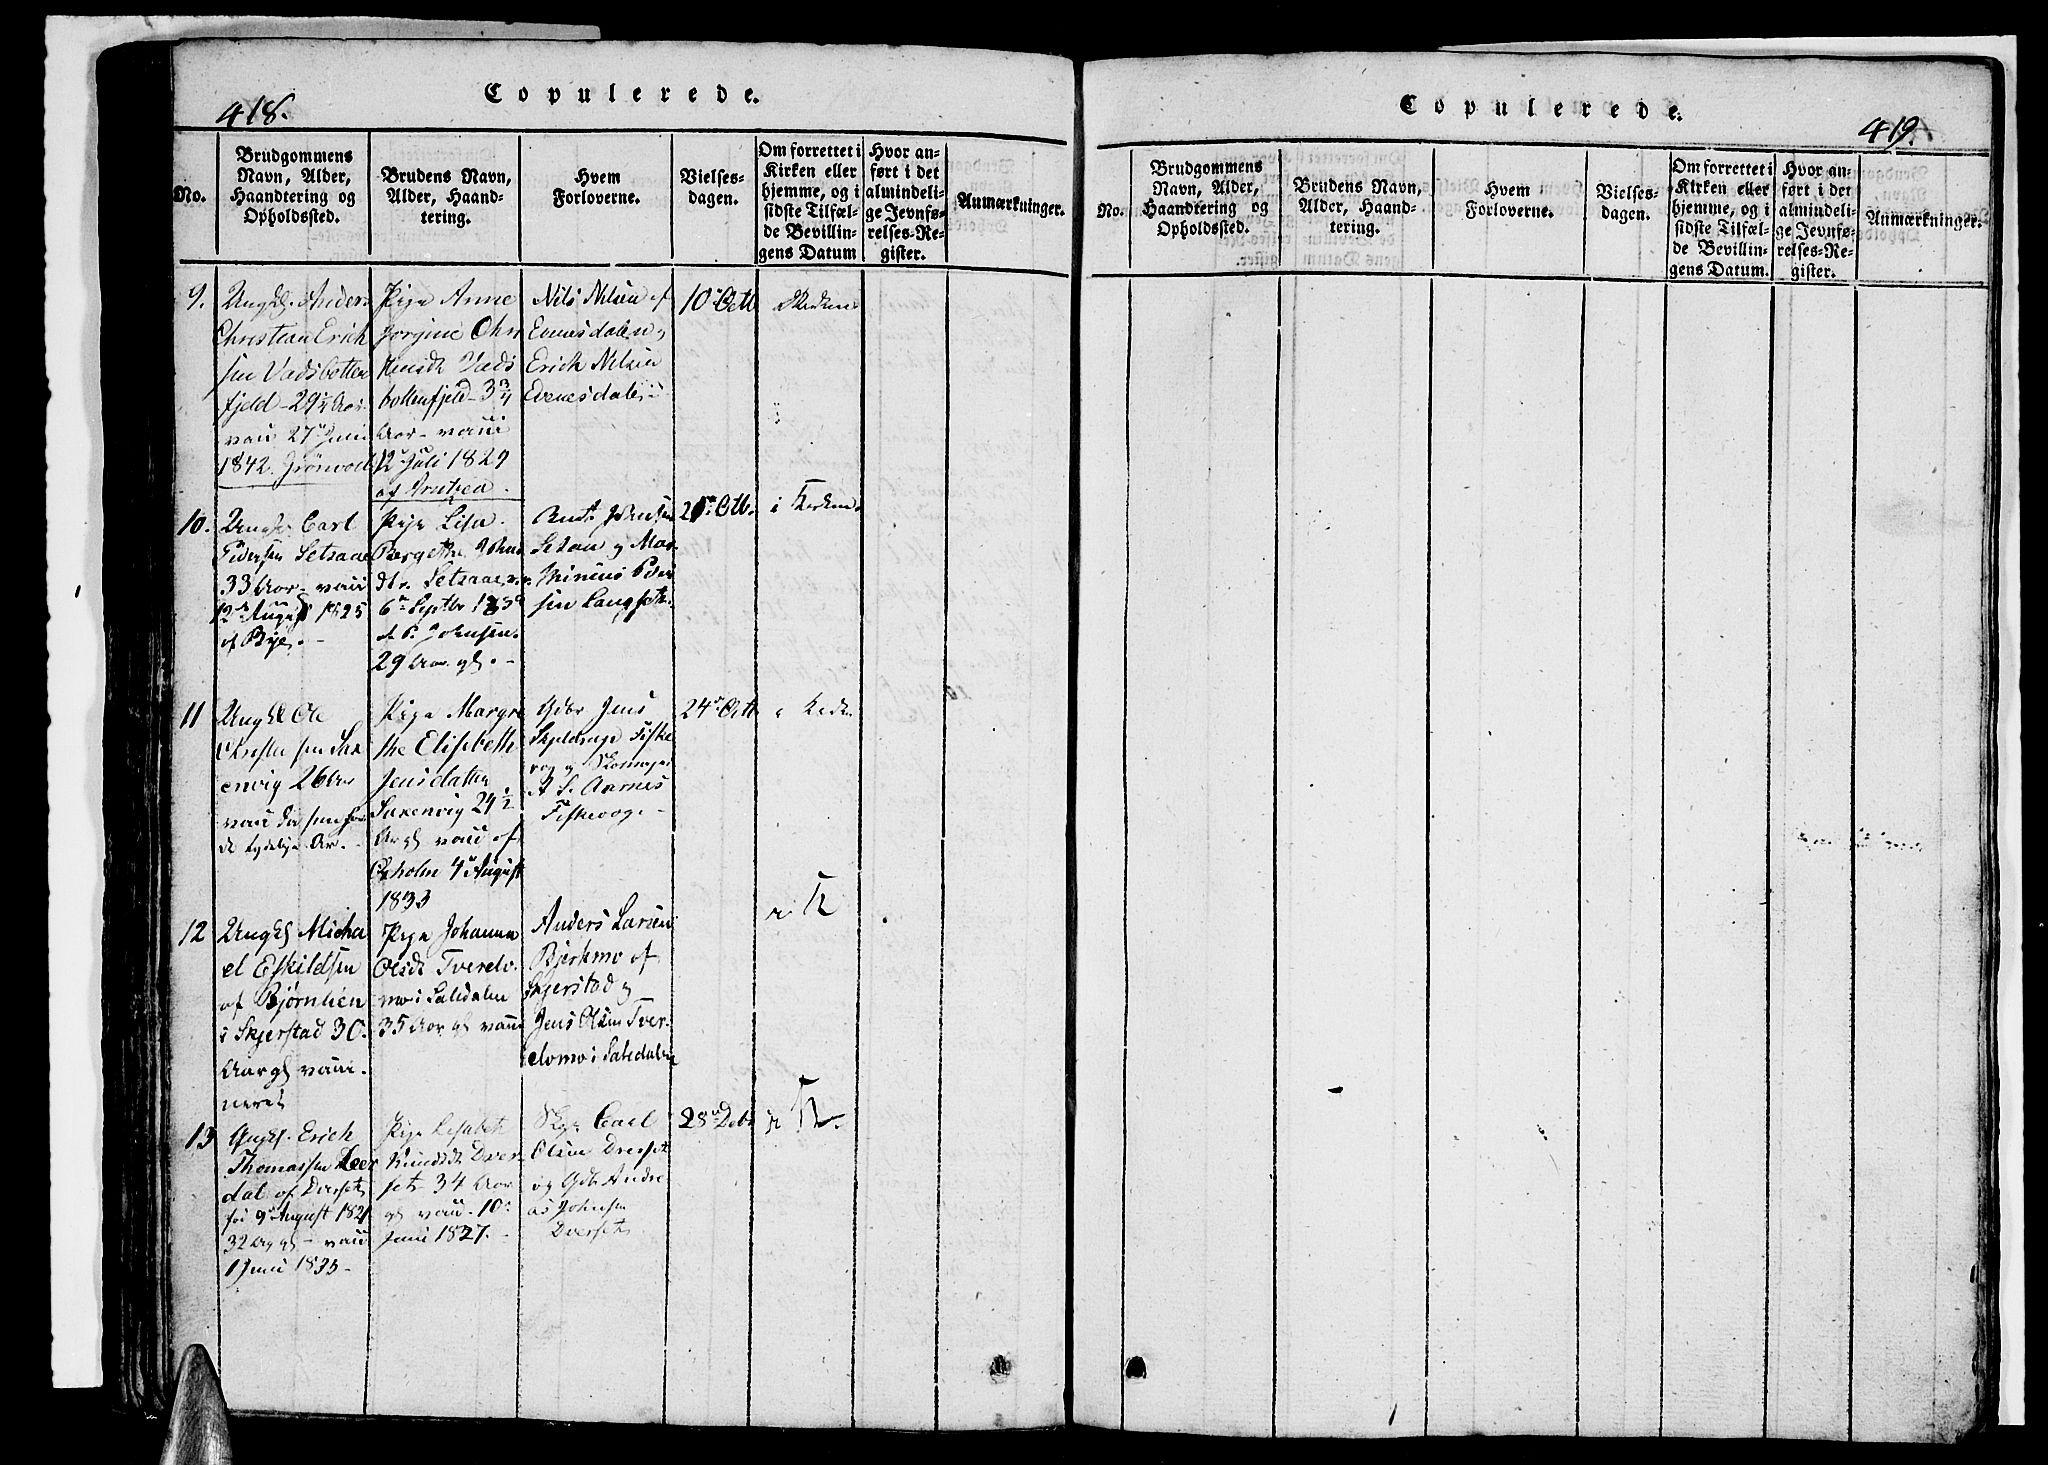 SAT, Ministerialprotokoller, klokkerbøker og fødselsregistre - Nordland, 847/L0676: Klokkerbok nr. 847C04, 1821-1853, s. 418-419